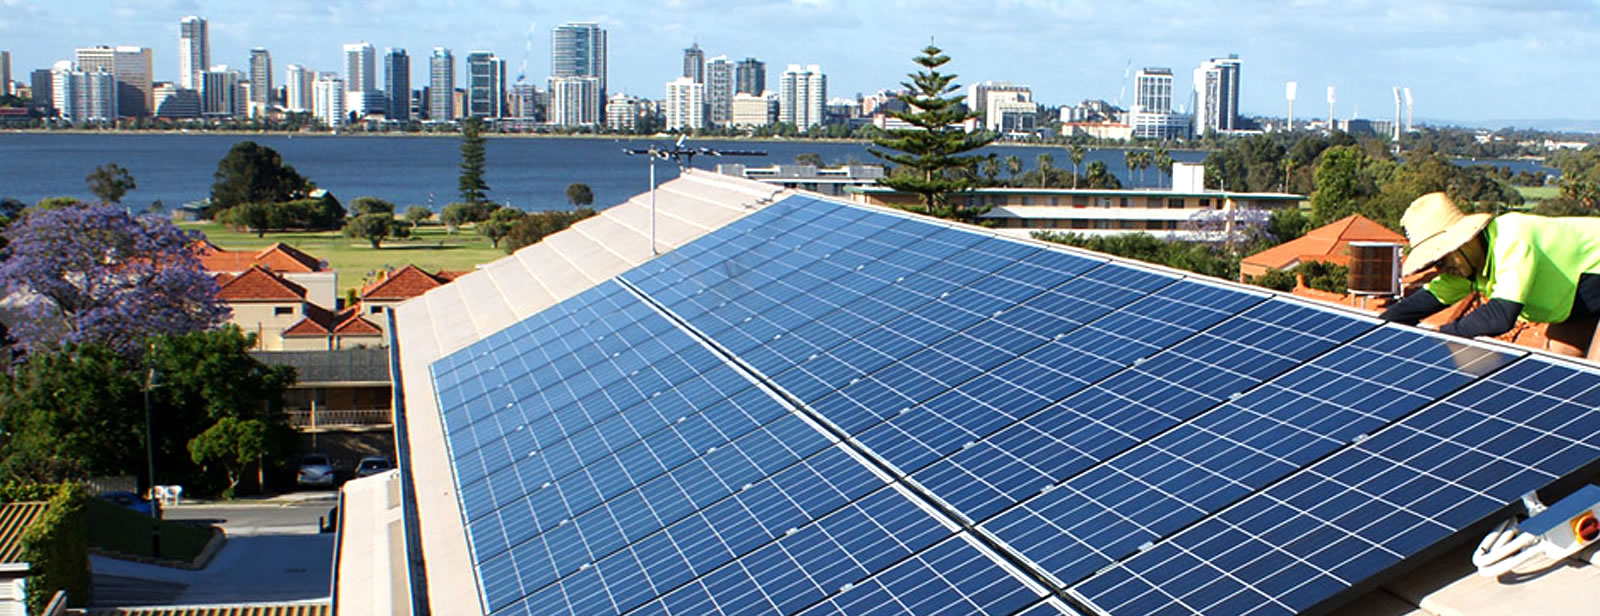 Commercial solar western Australia